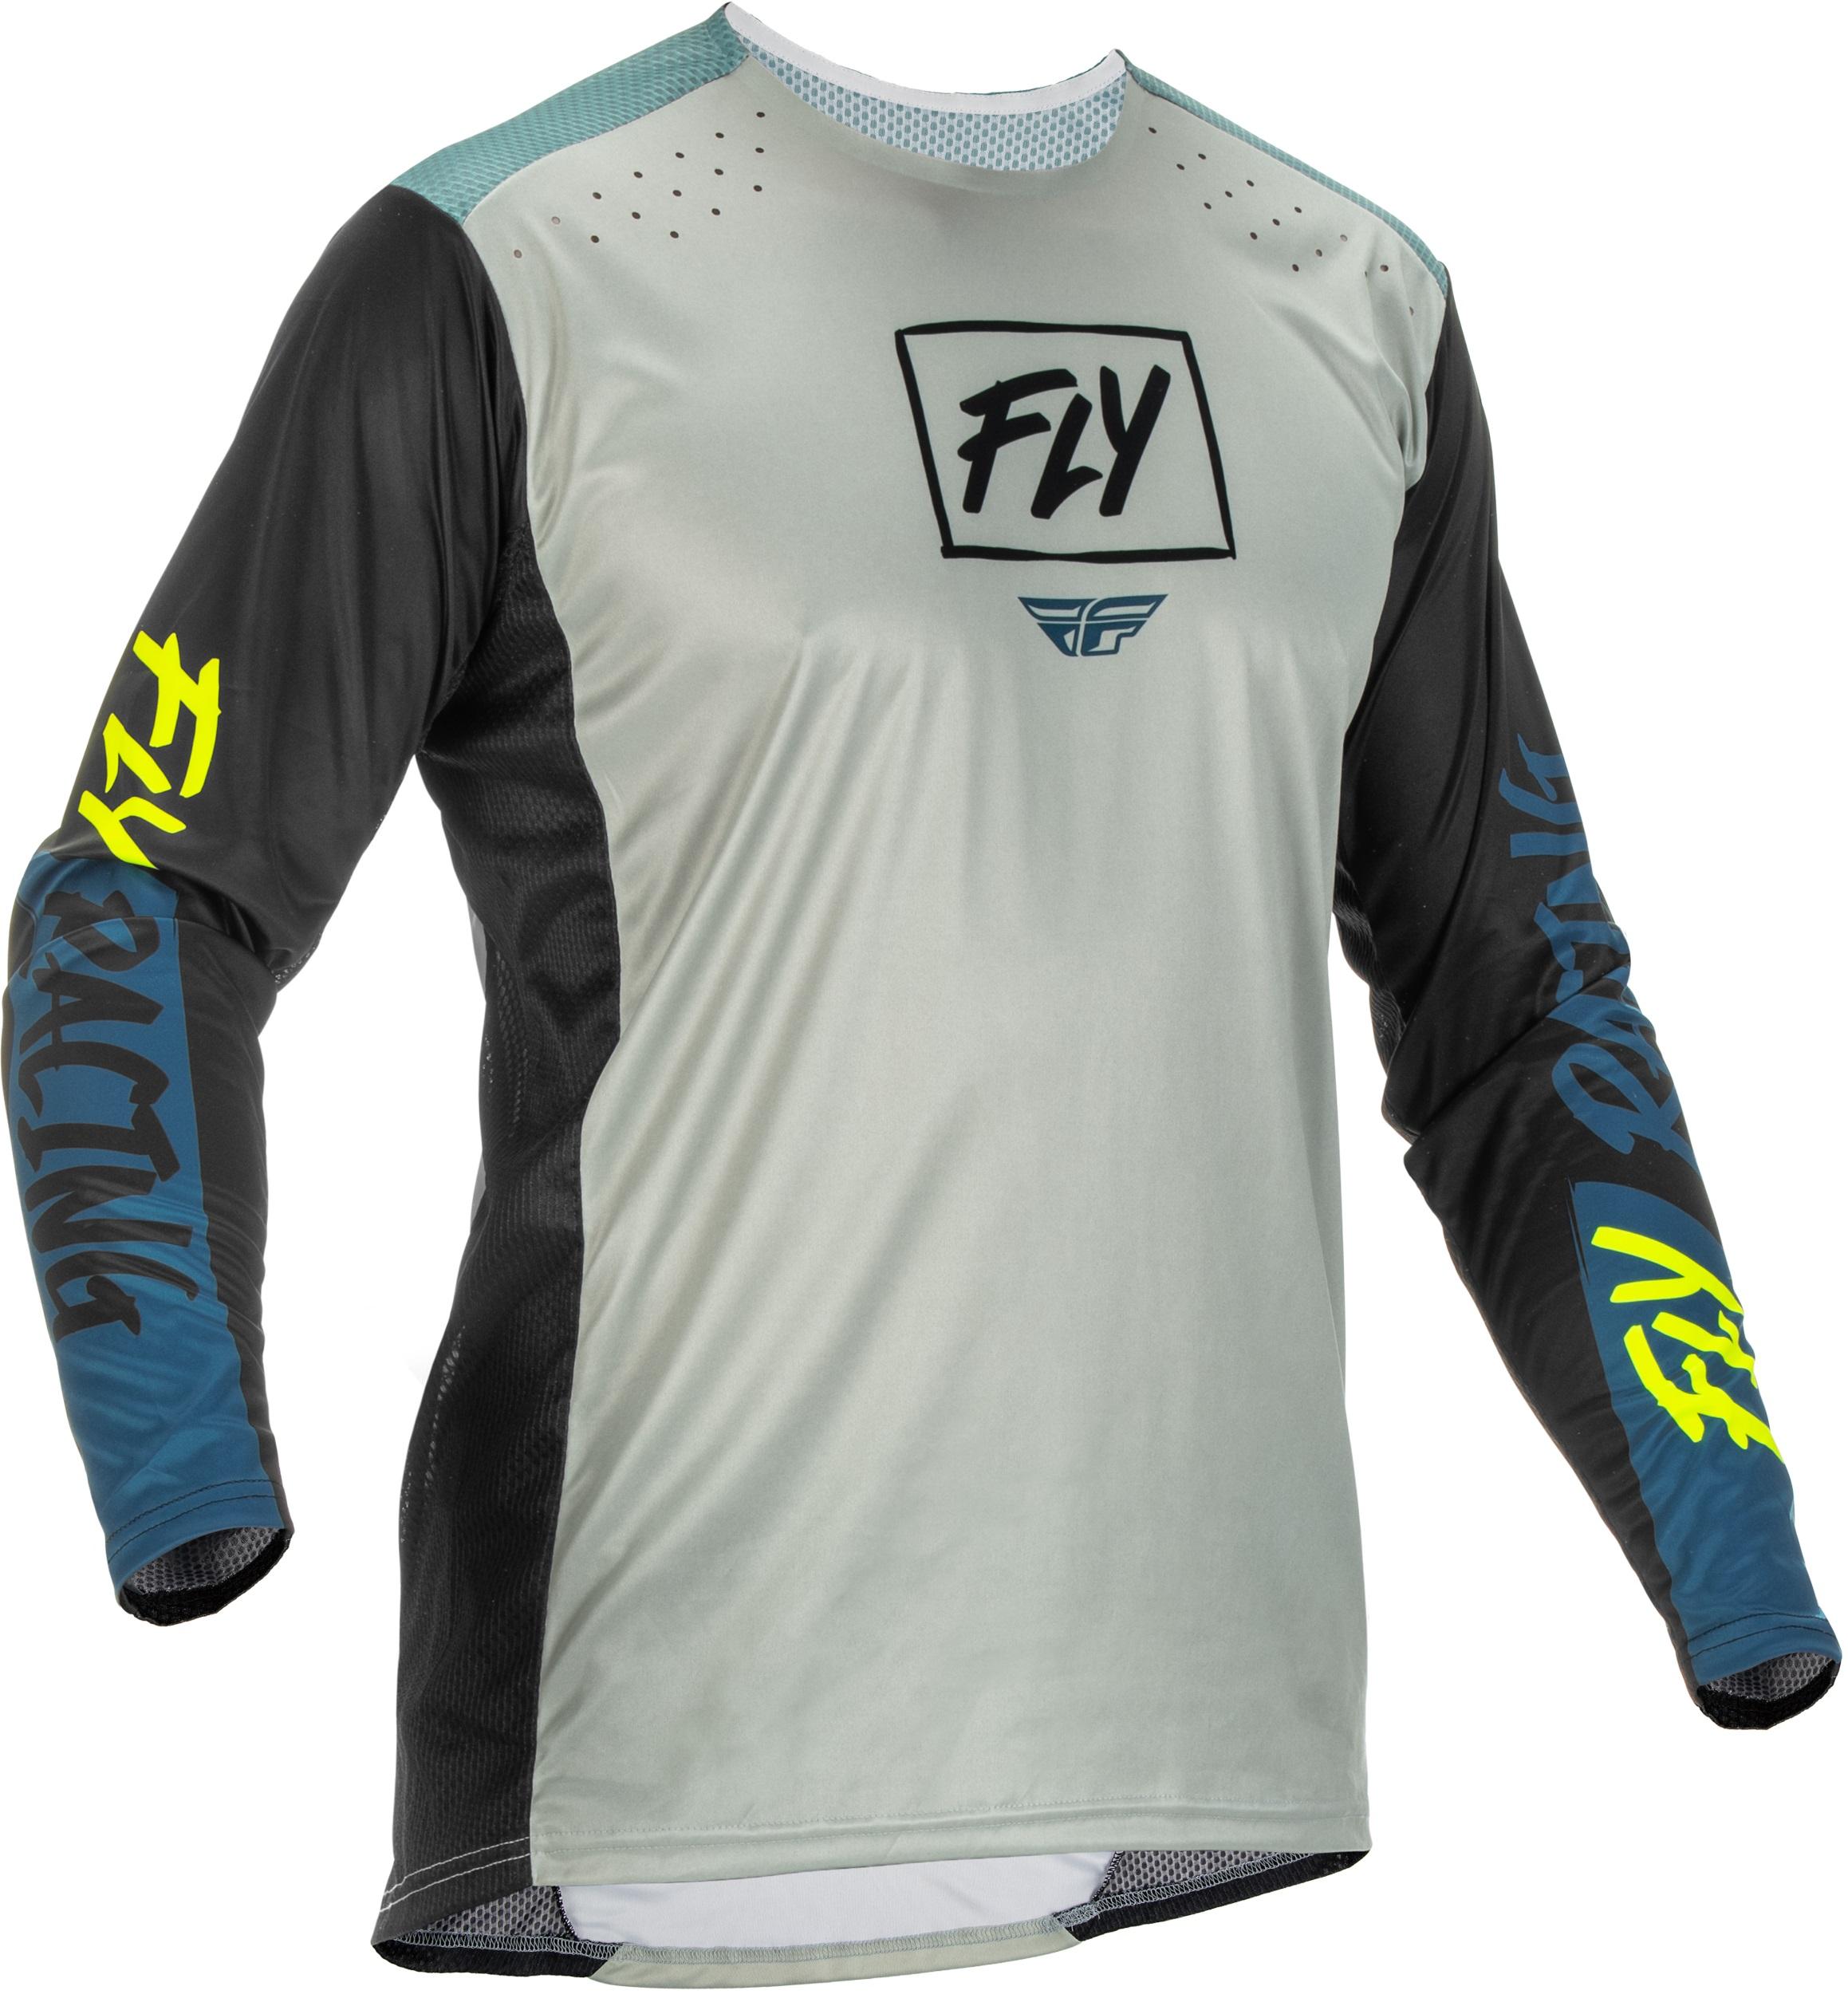 Fly Racing 2022 Lite Grey/Teal/Hi-Vis Jersey